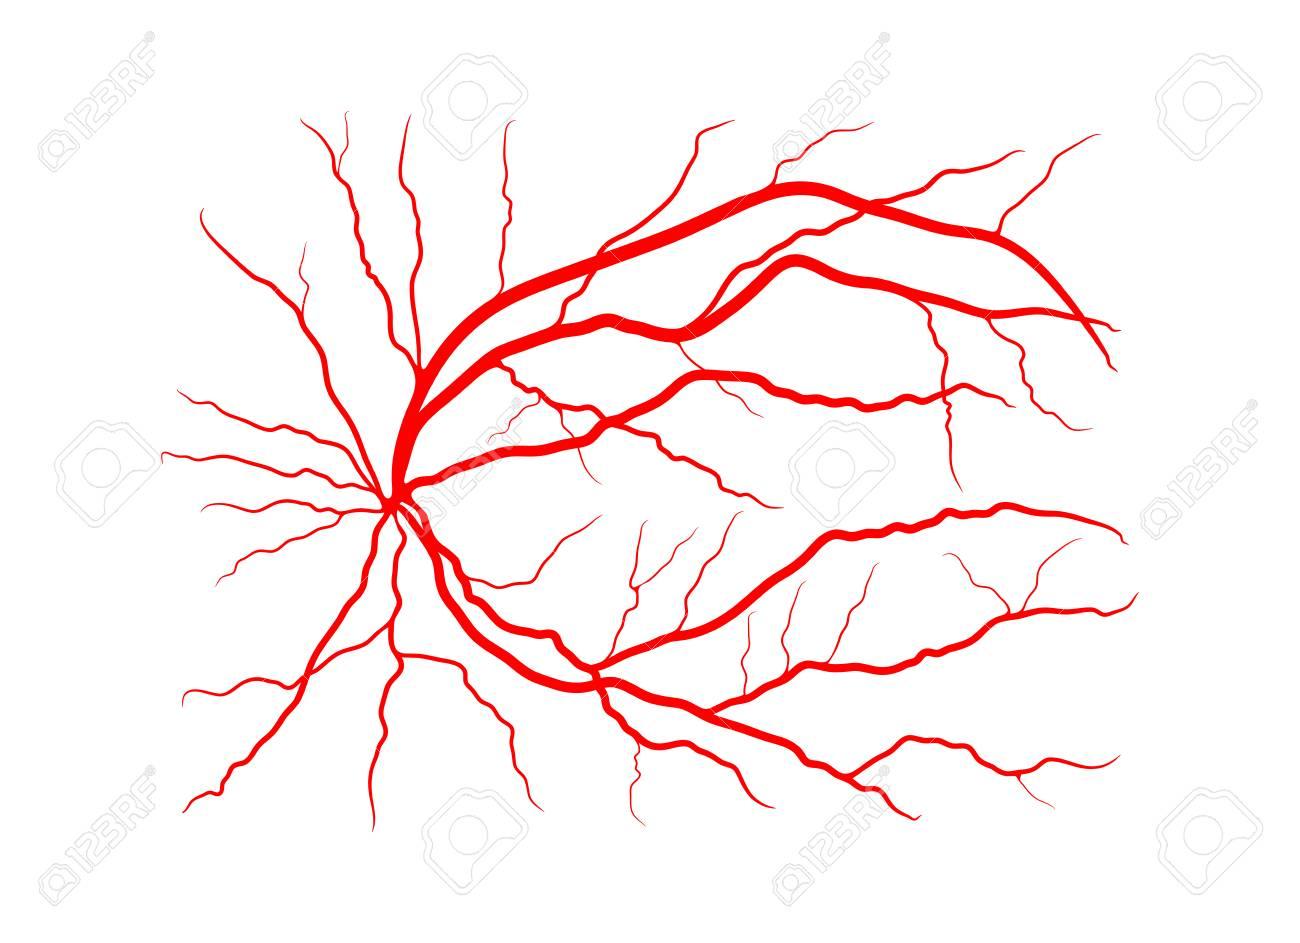 Eyeball clipart vein. Free download clip art